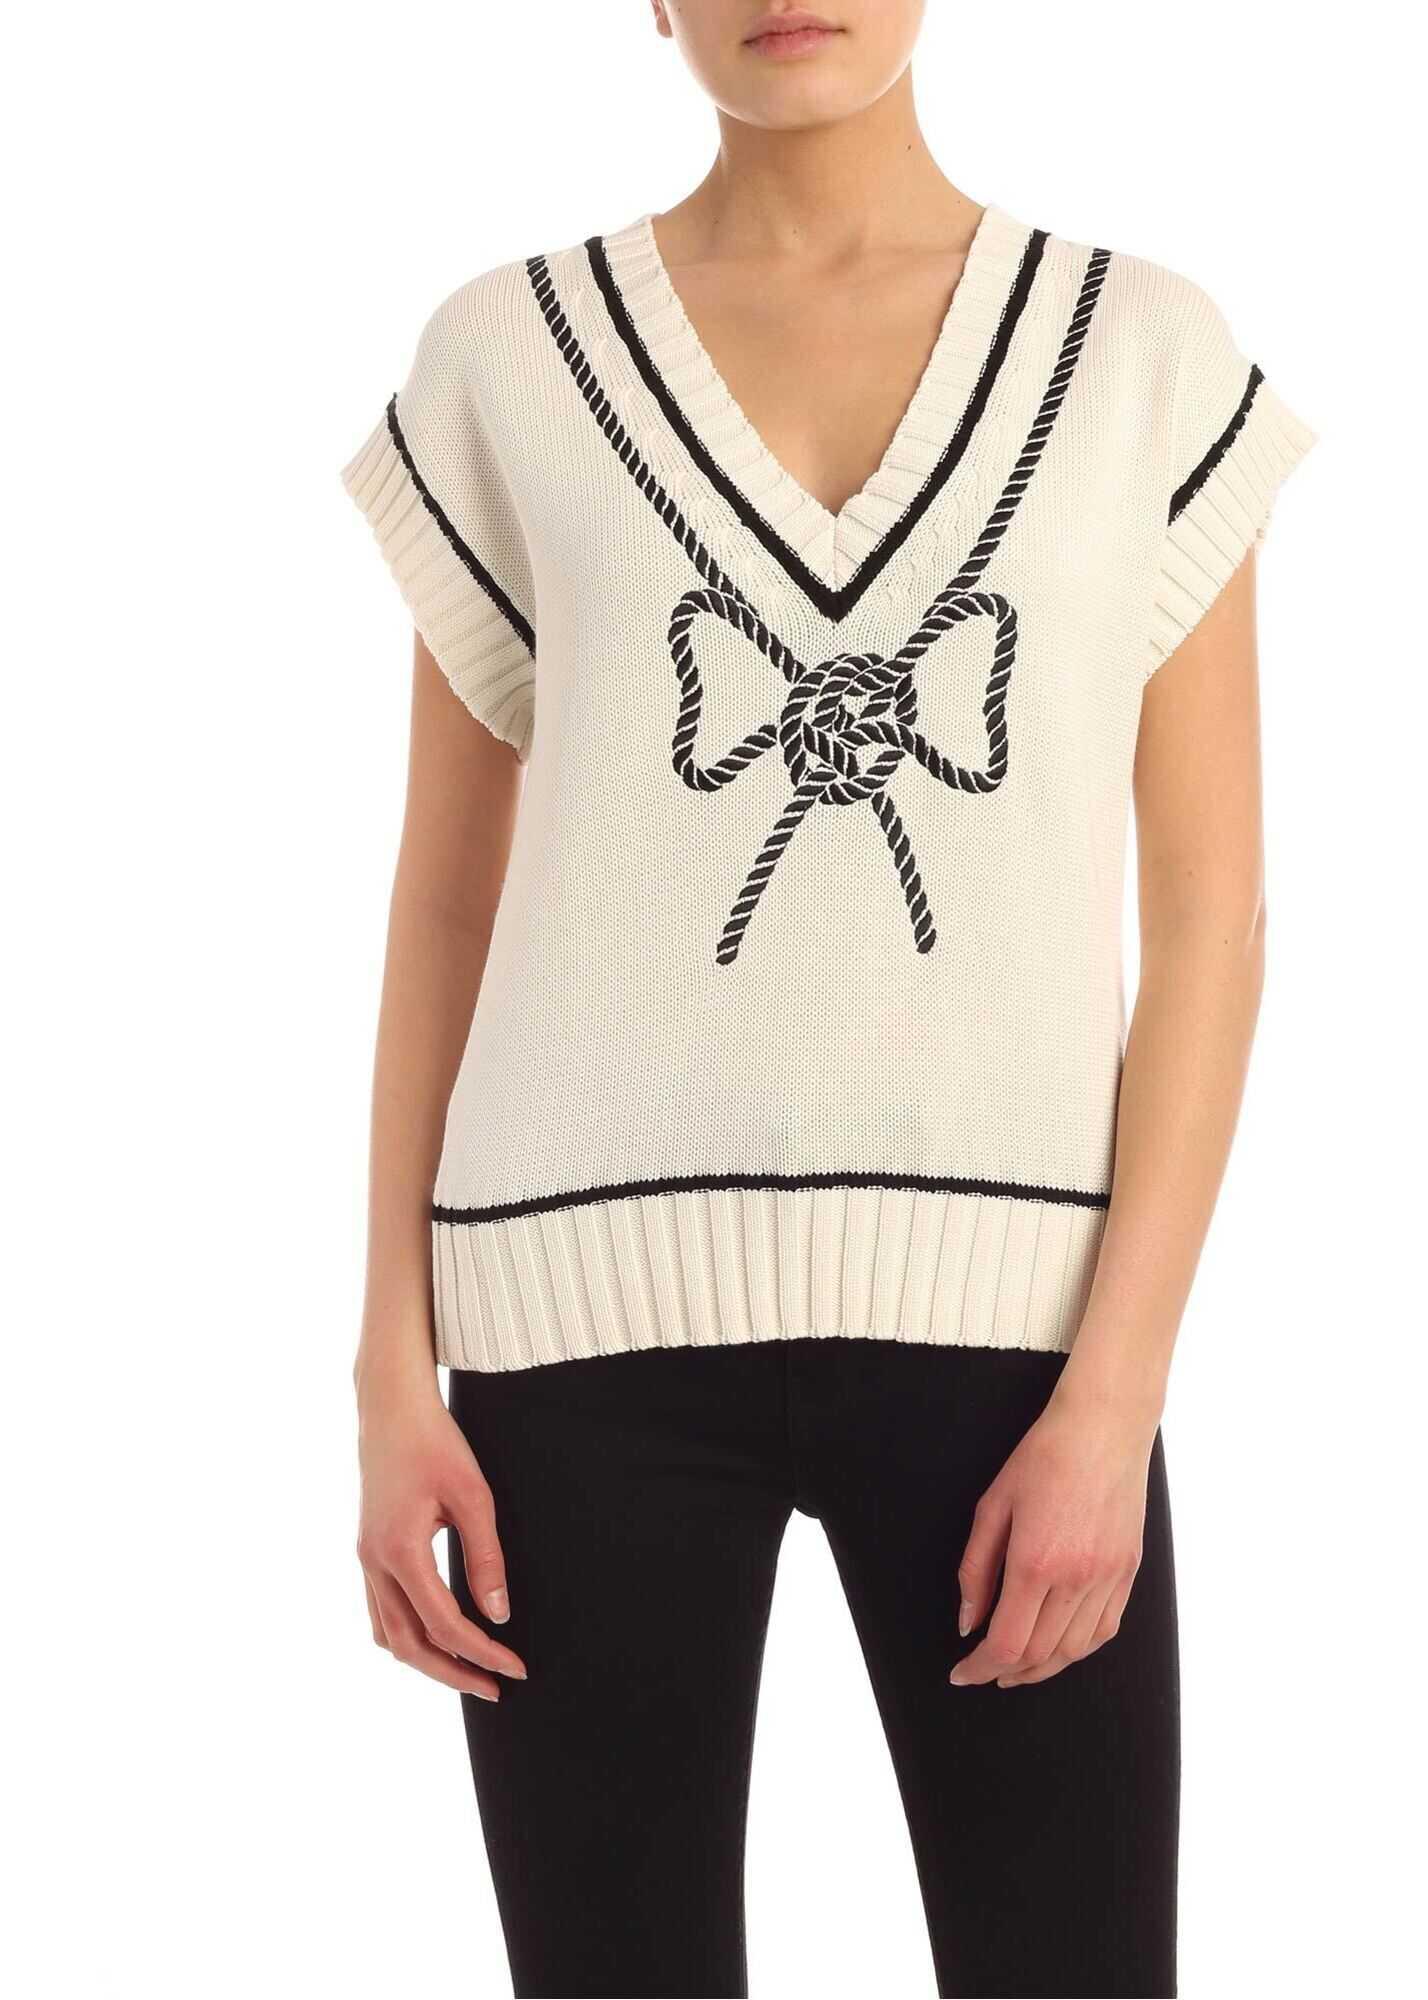 Vivetta Bow Embroidery Sleeveless Pullover In Ecru Color White